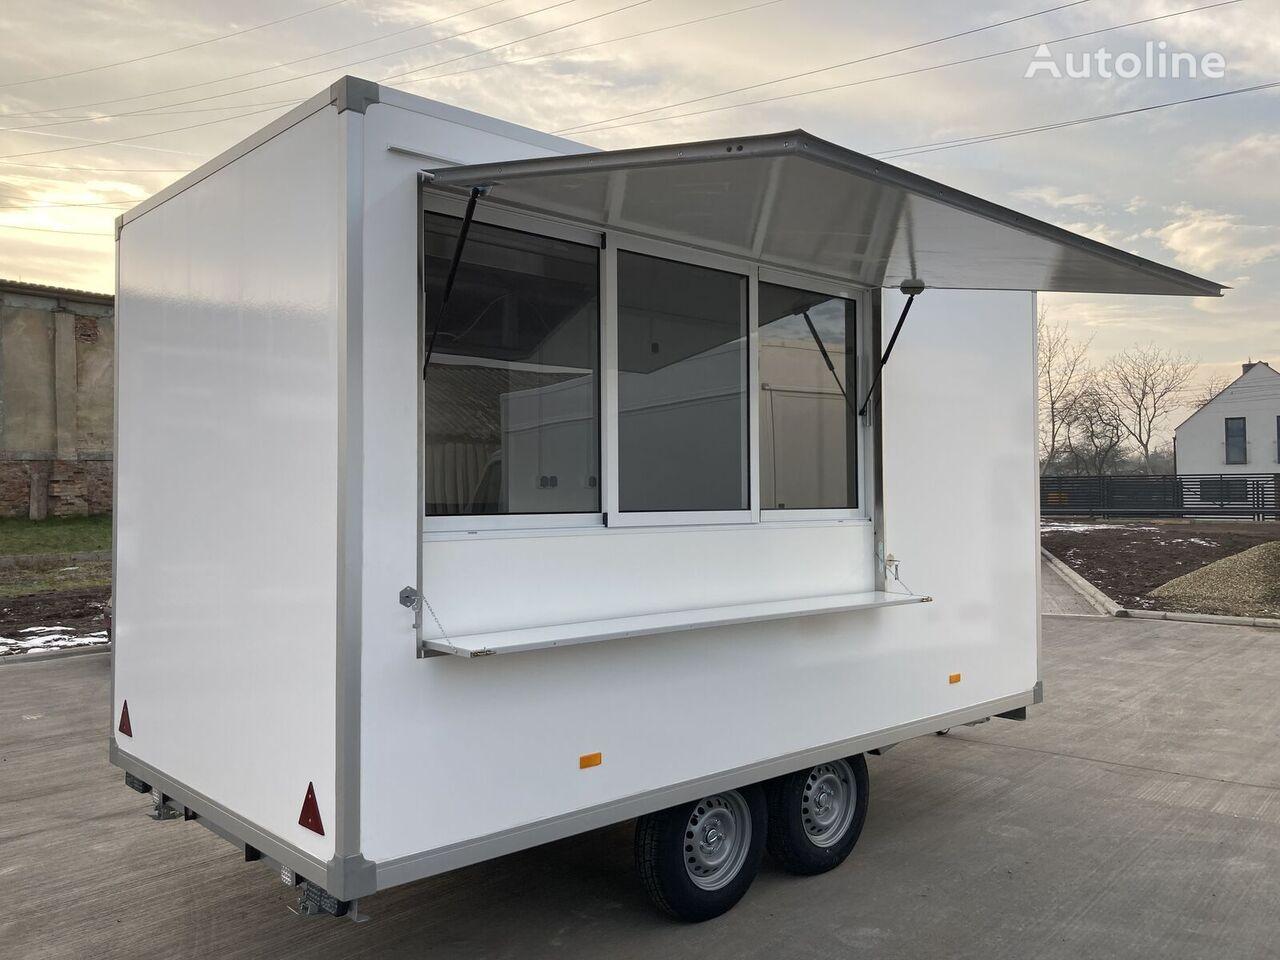 IMBISS, Przyczepa Gastronomiczna, Food Truck, Catering Trailers remolque de venta nuevo